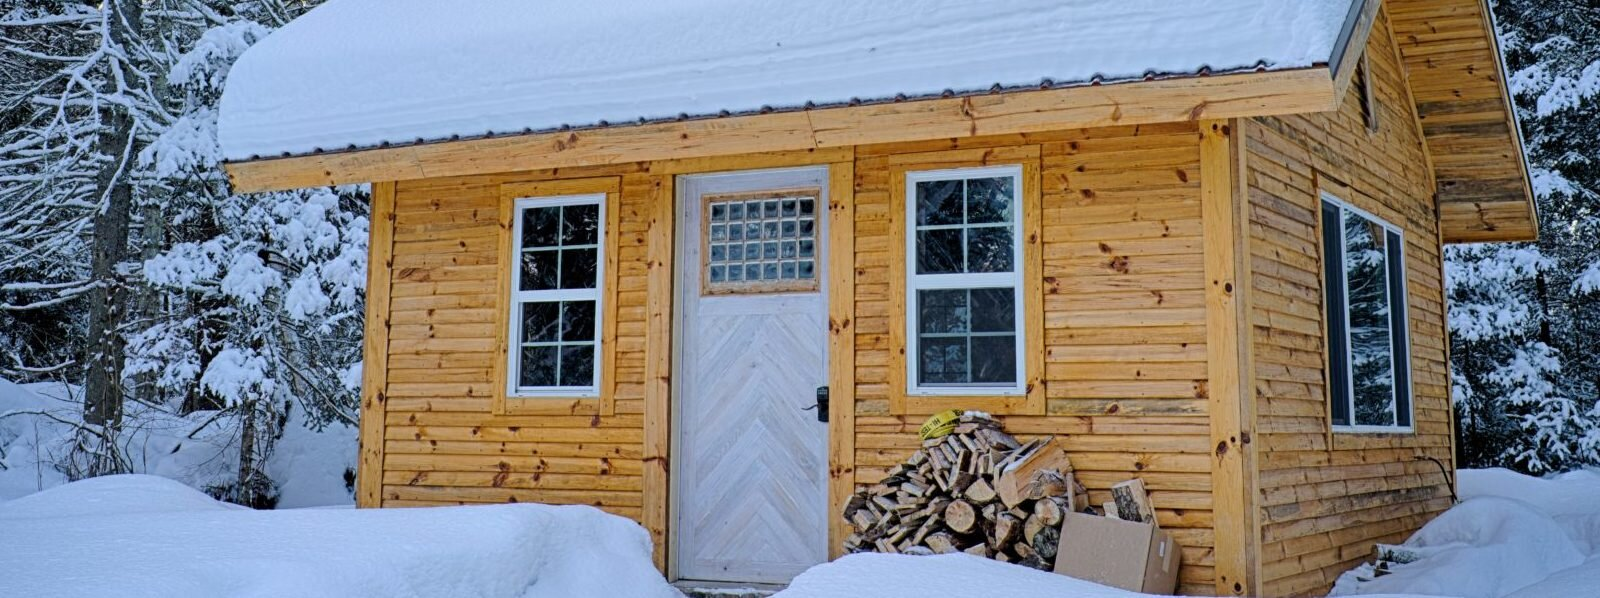 bungalow-cabin-chalet-749231-e1544117226969-1600x598.jpg